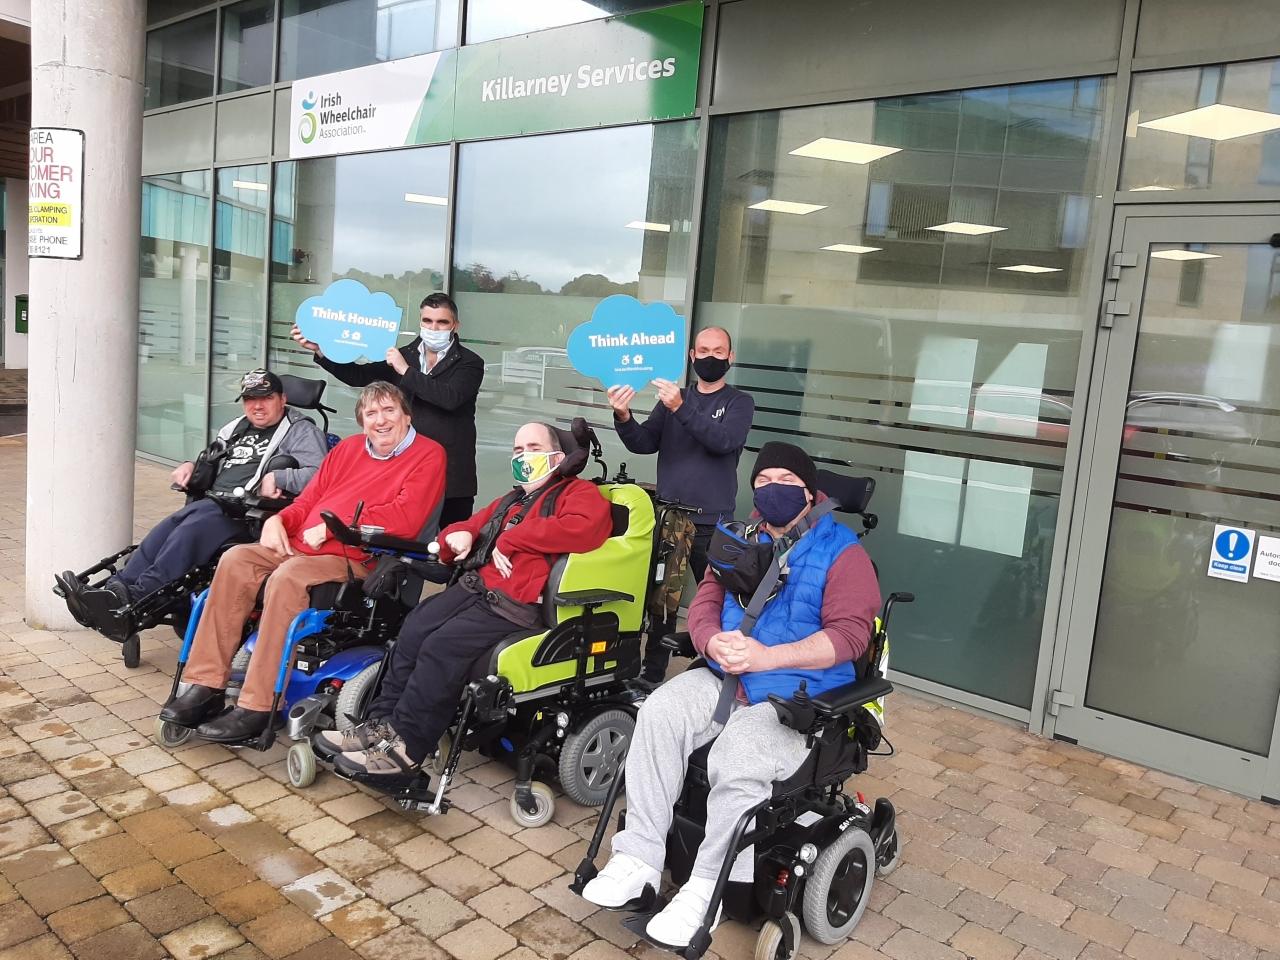 0206569_Irish_Wheelchair_Association_Killarney_Housing_Campaign_Caption_in_email.jpg